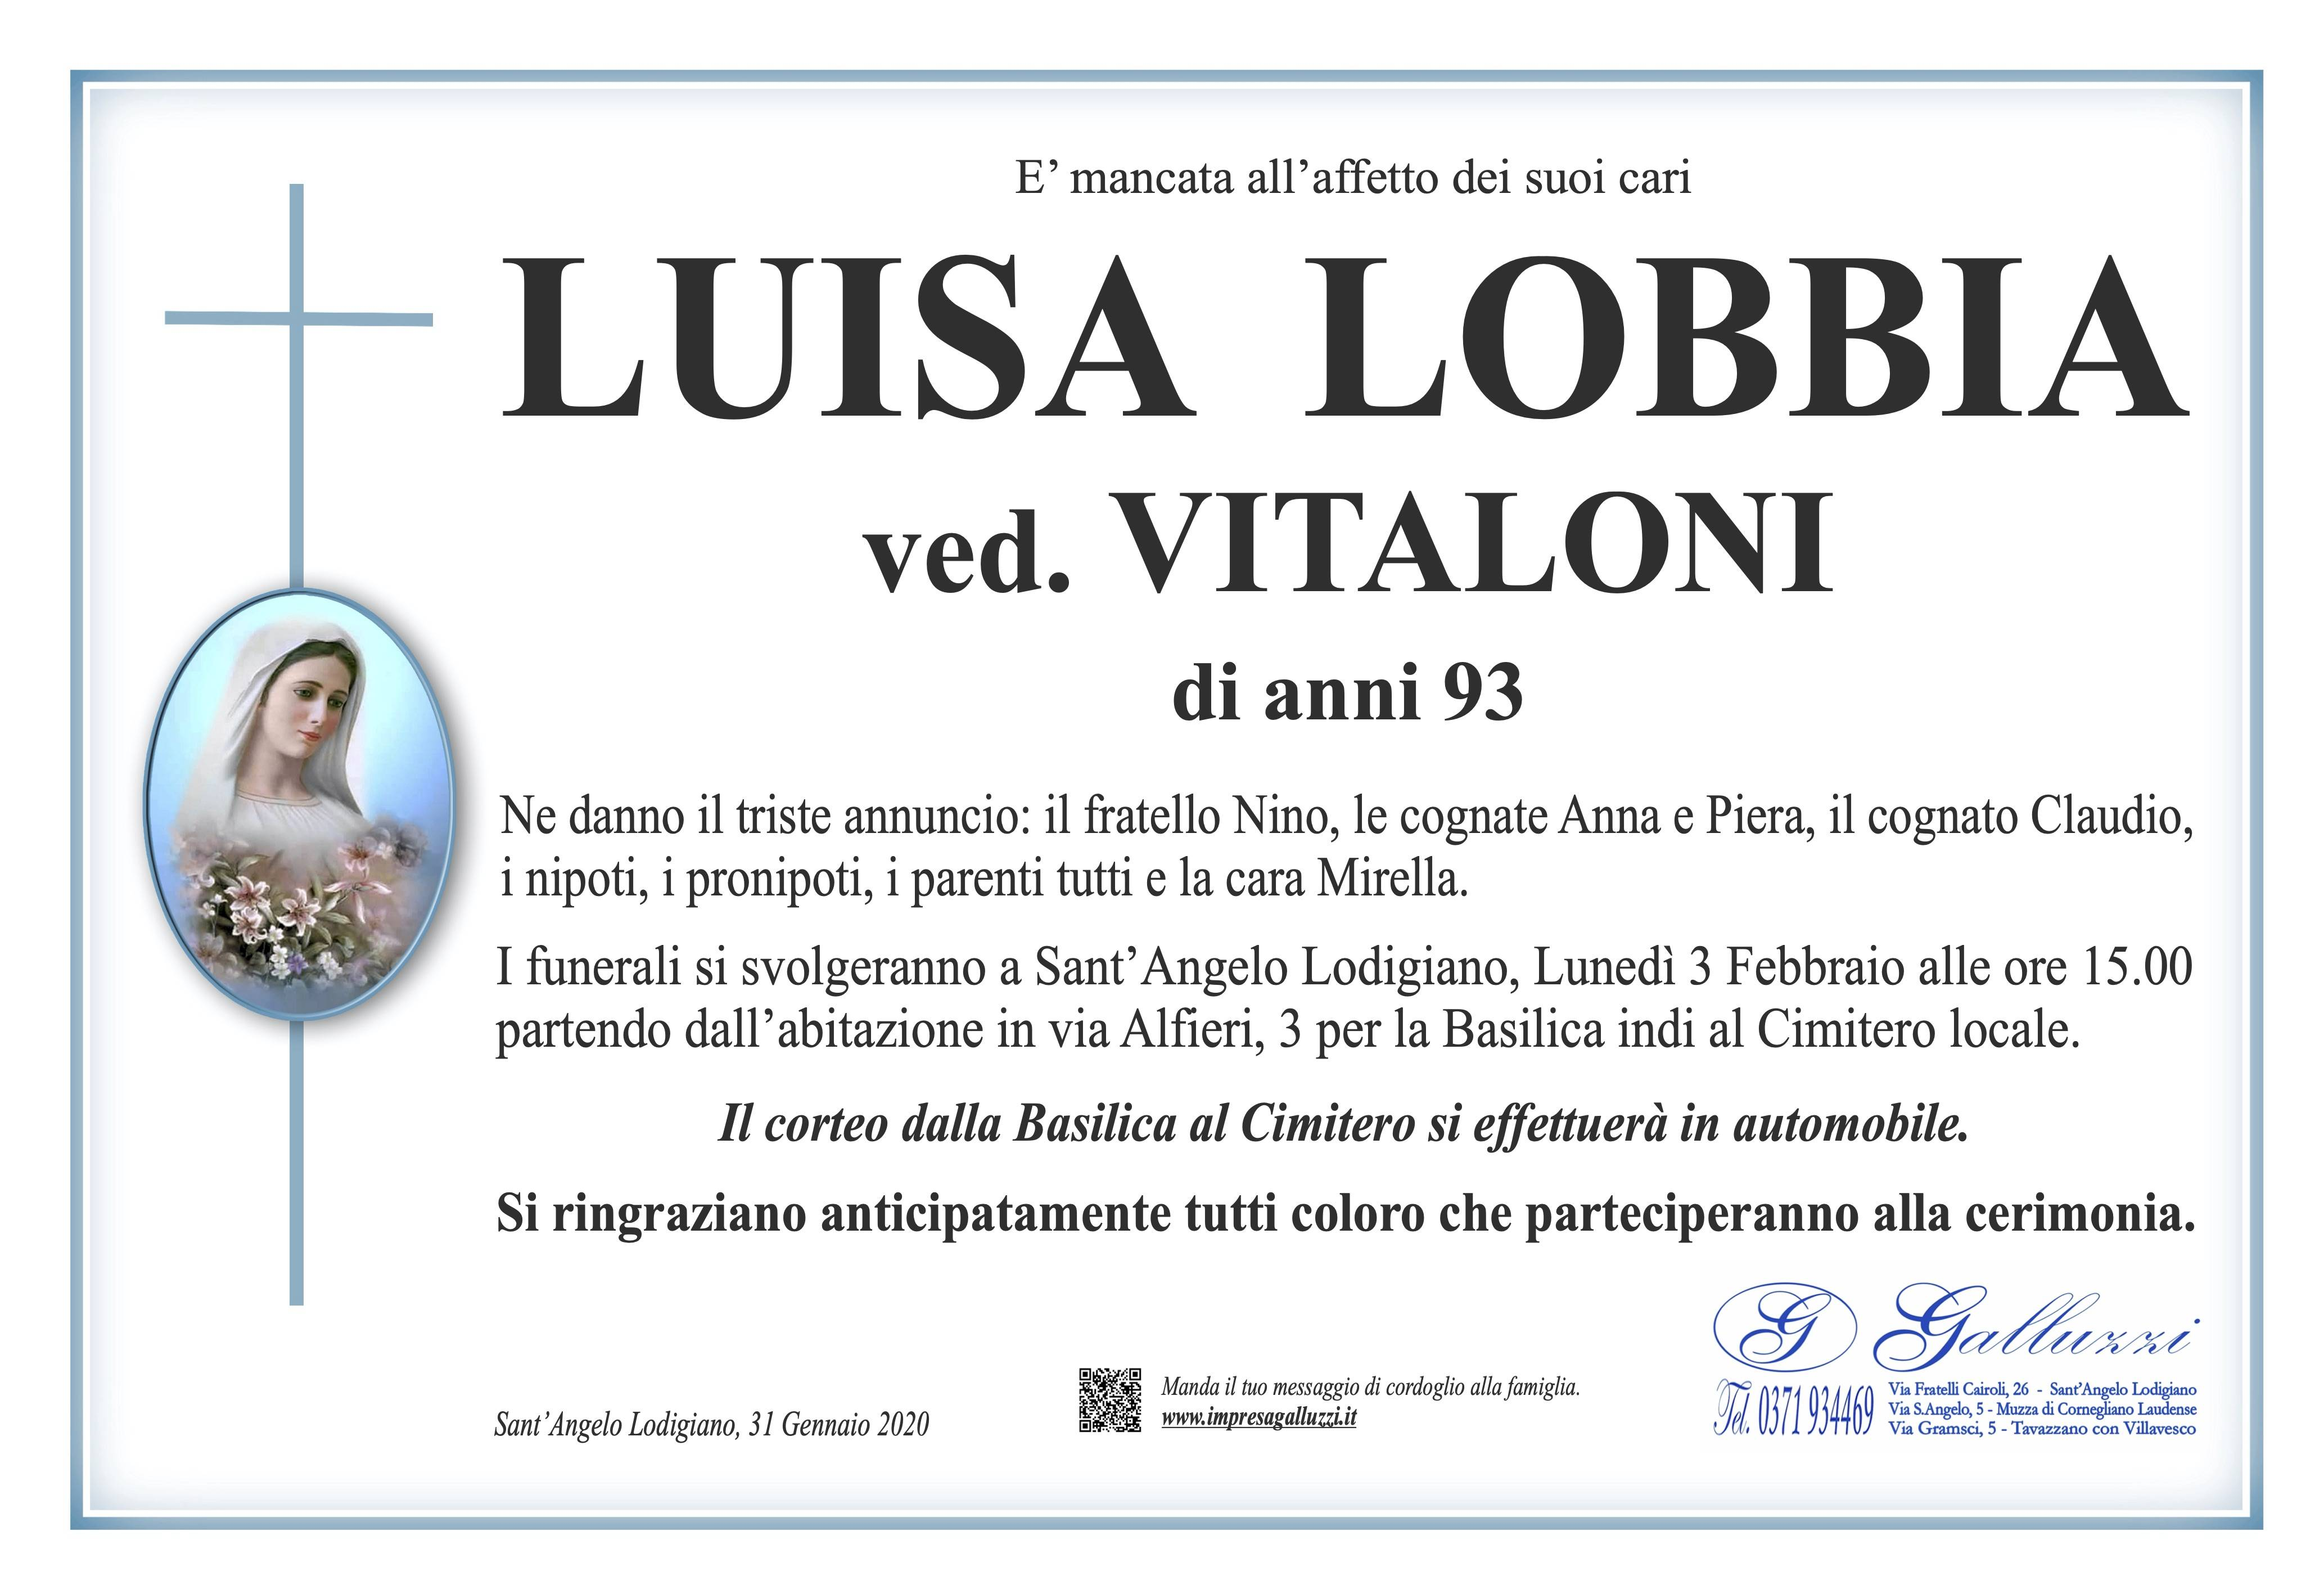 Luisa Lobbia